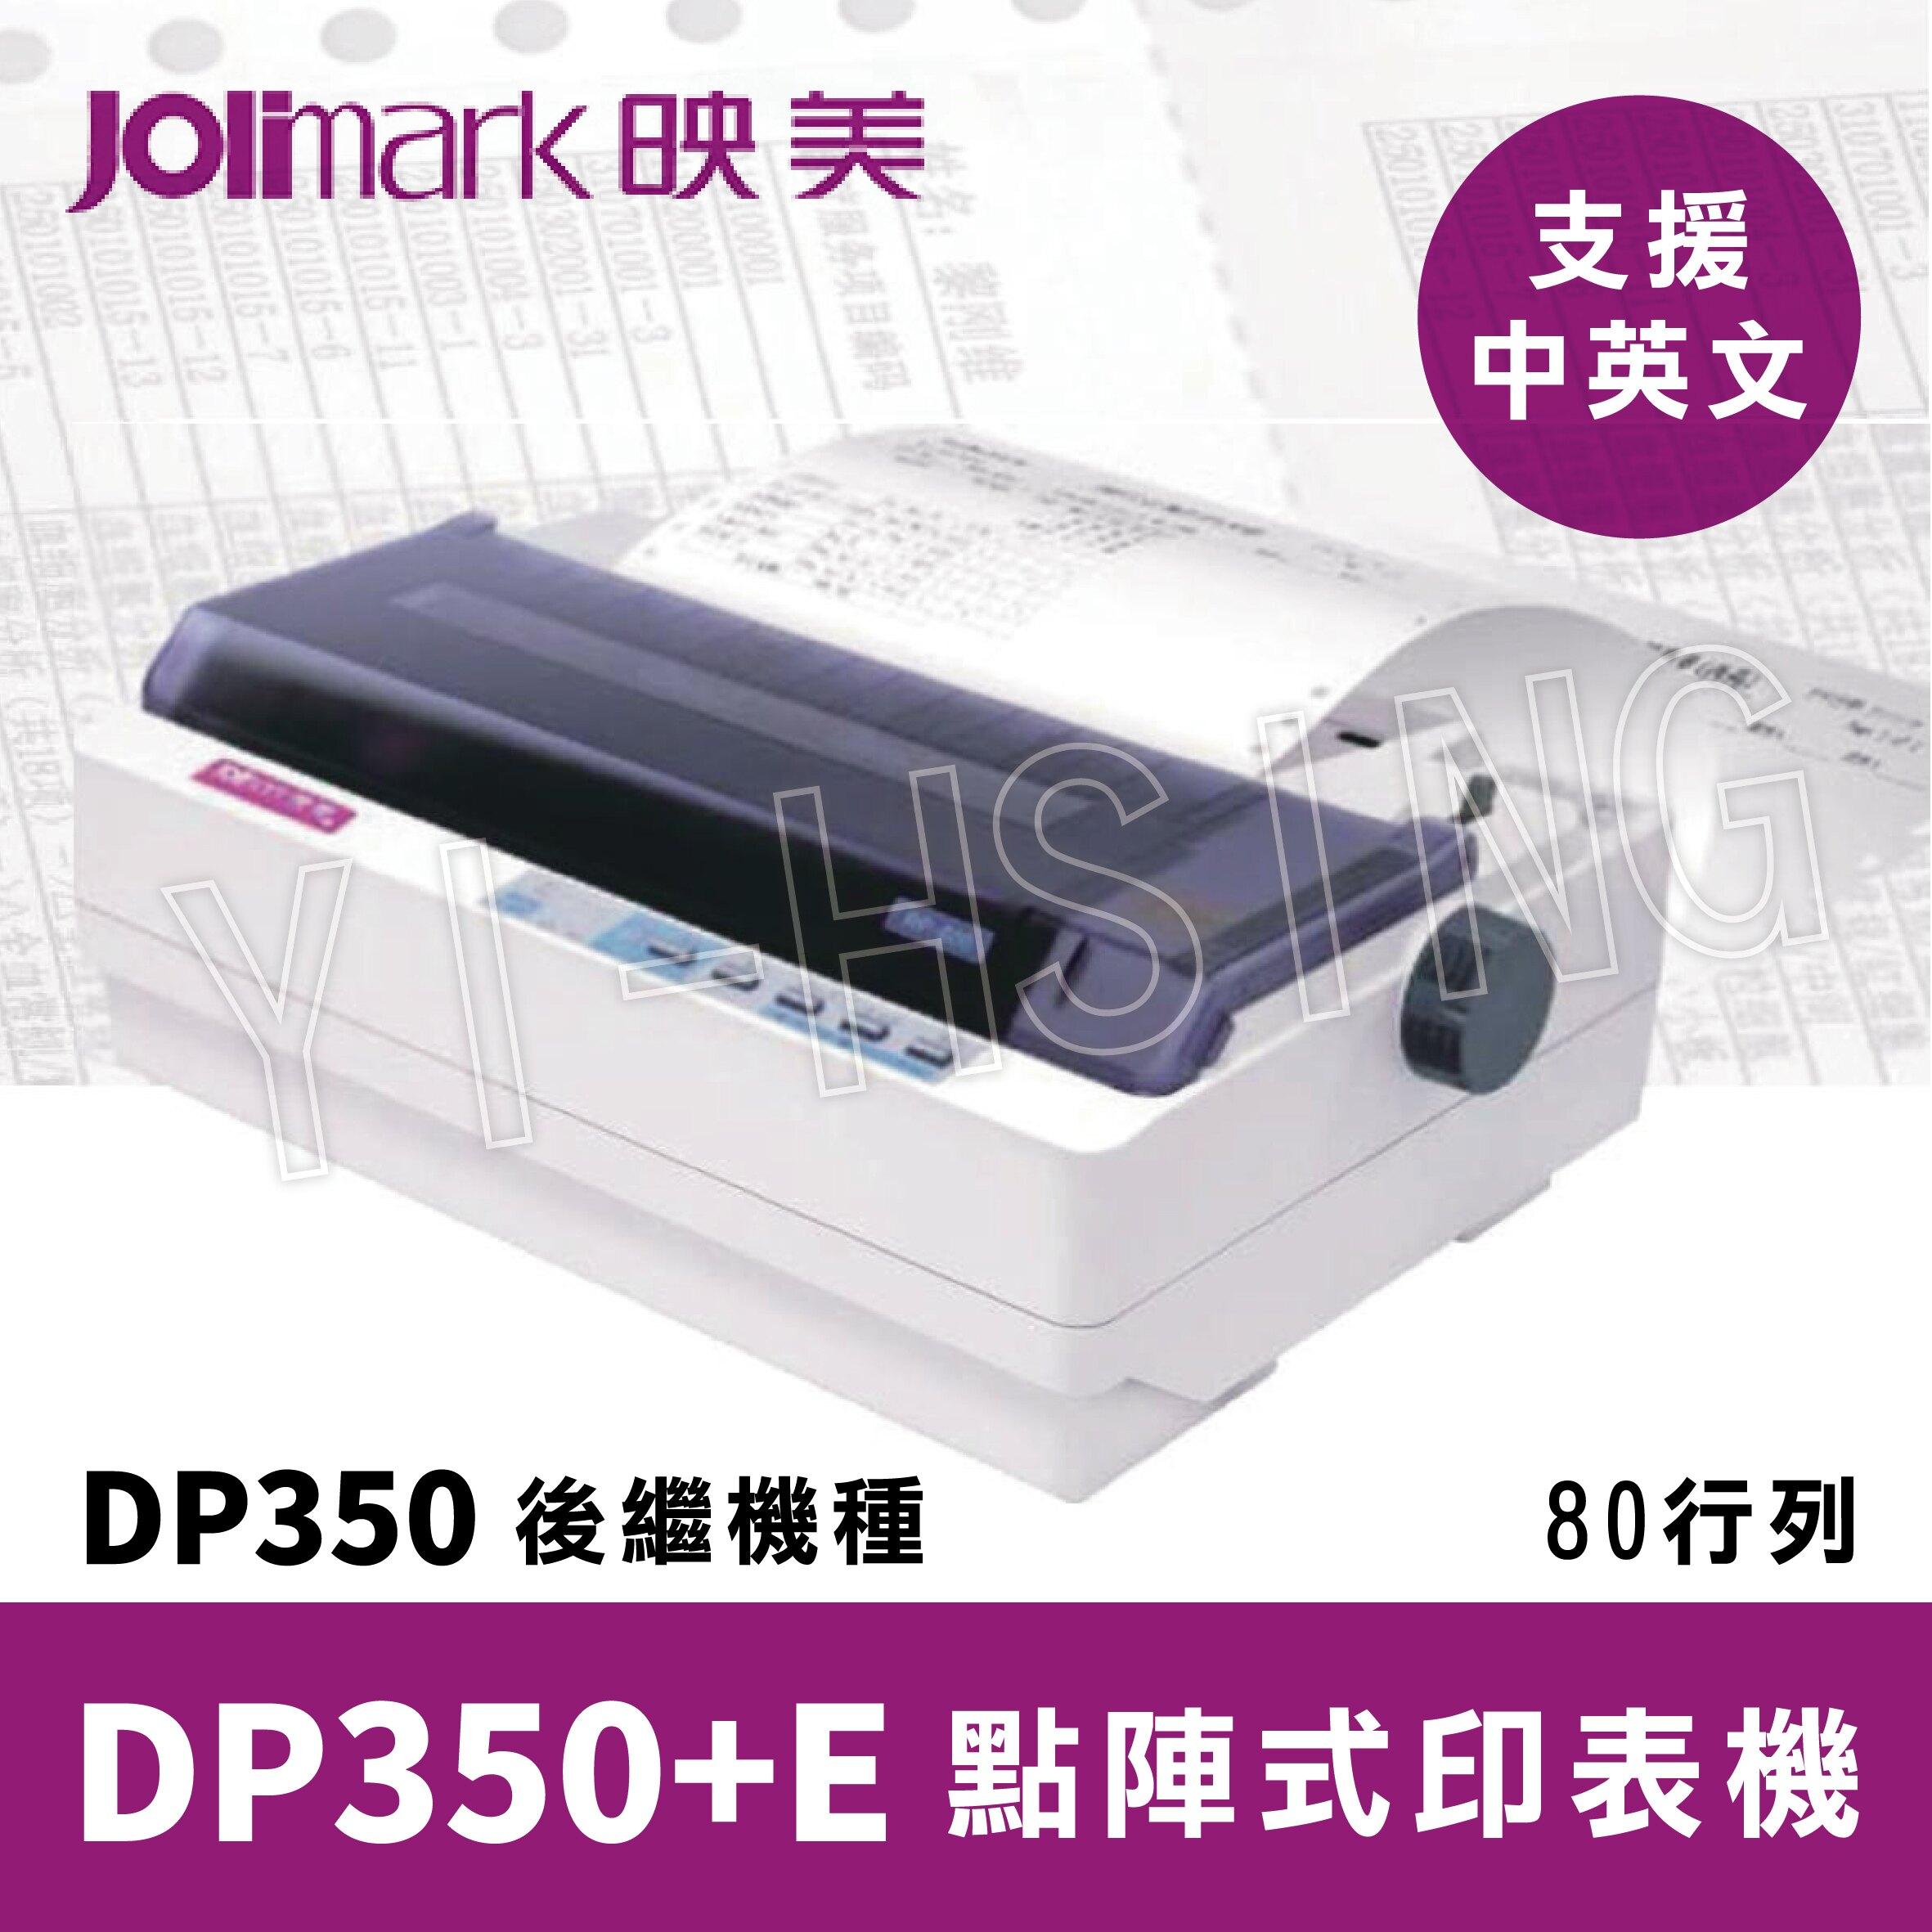 Jolimark 映美 DP350+E 點陣式中英文印表機80行列滾筒式